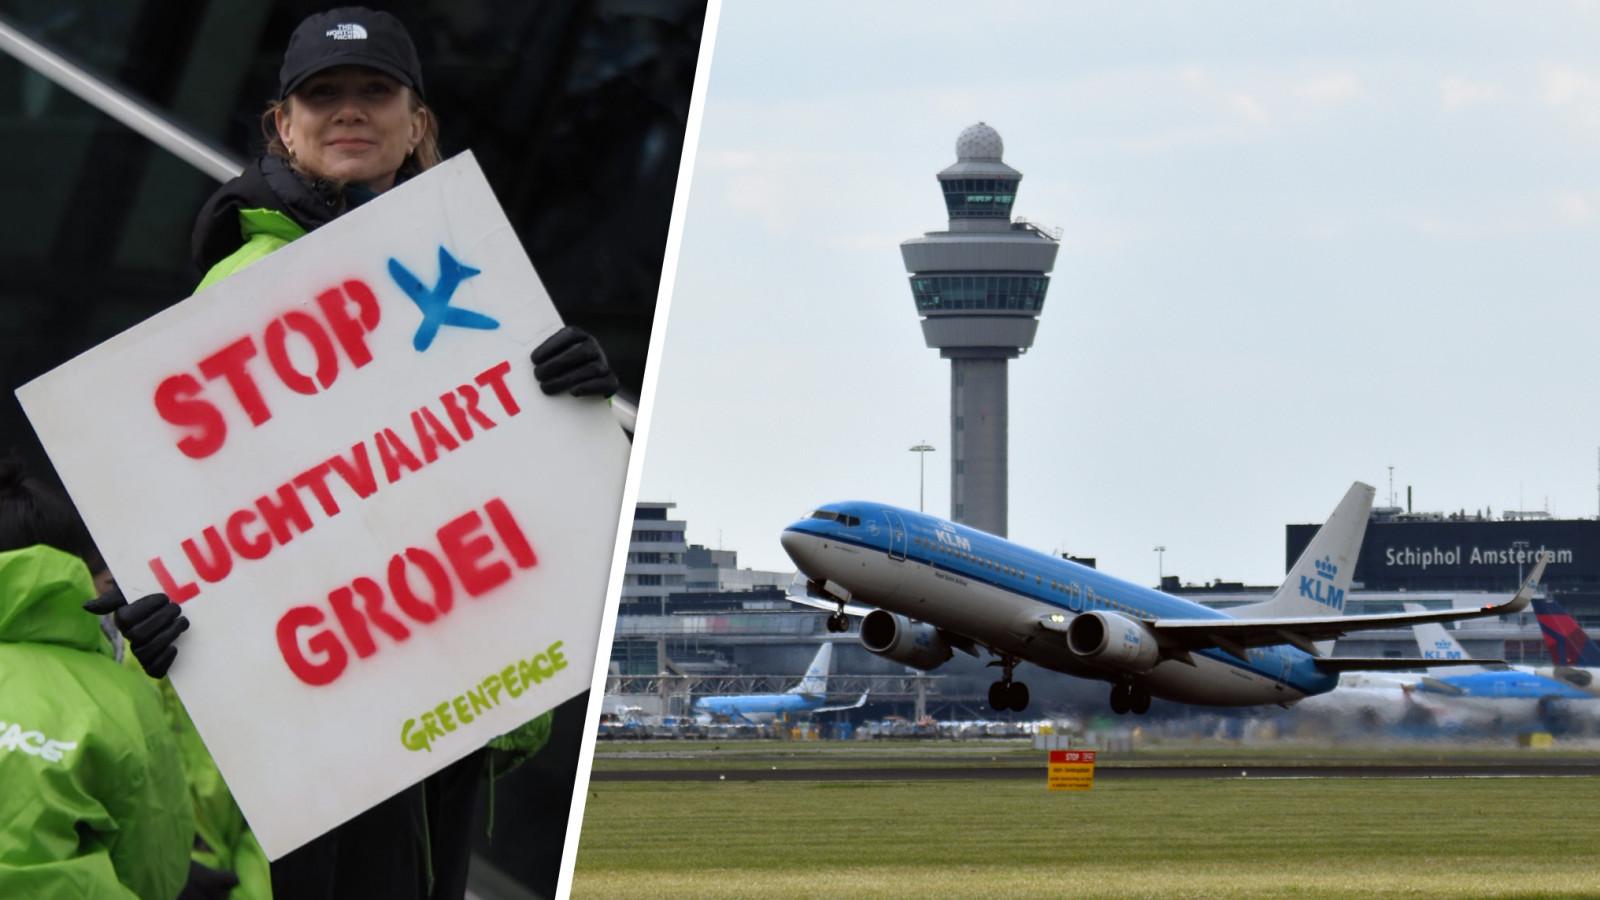 Greenpeace / NH Nieuws/Doron Sajet